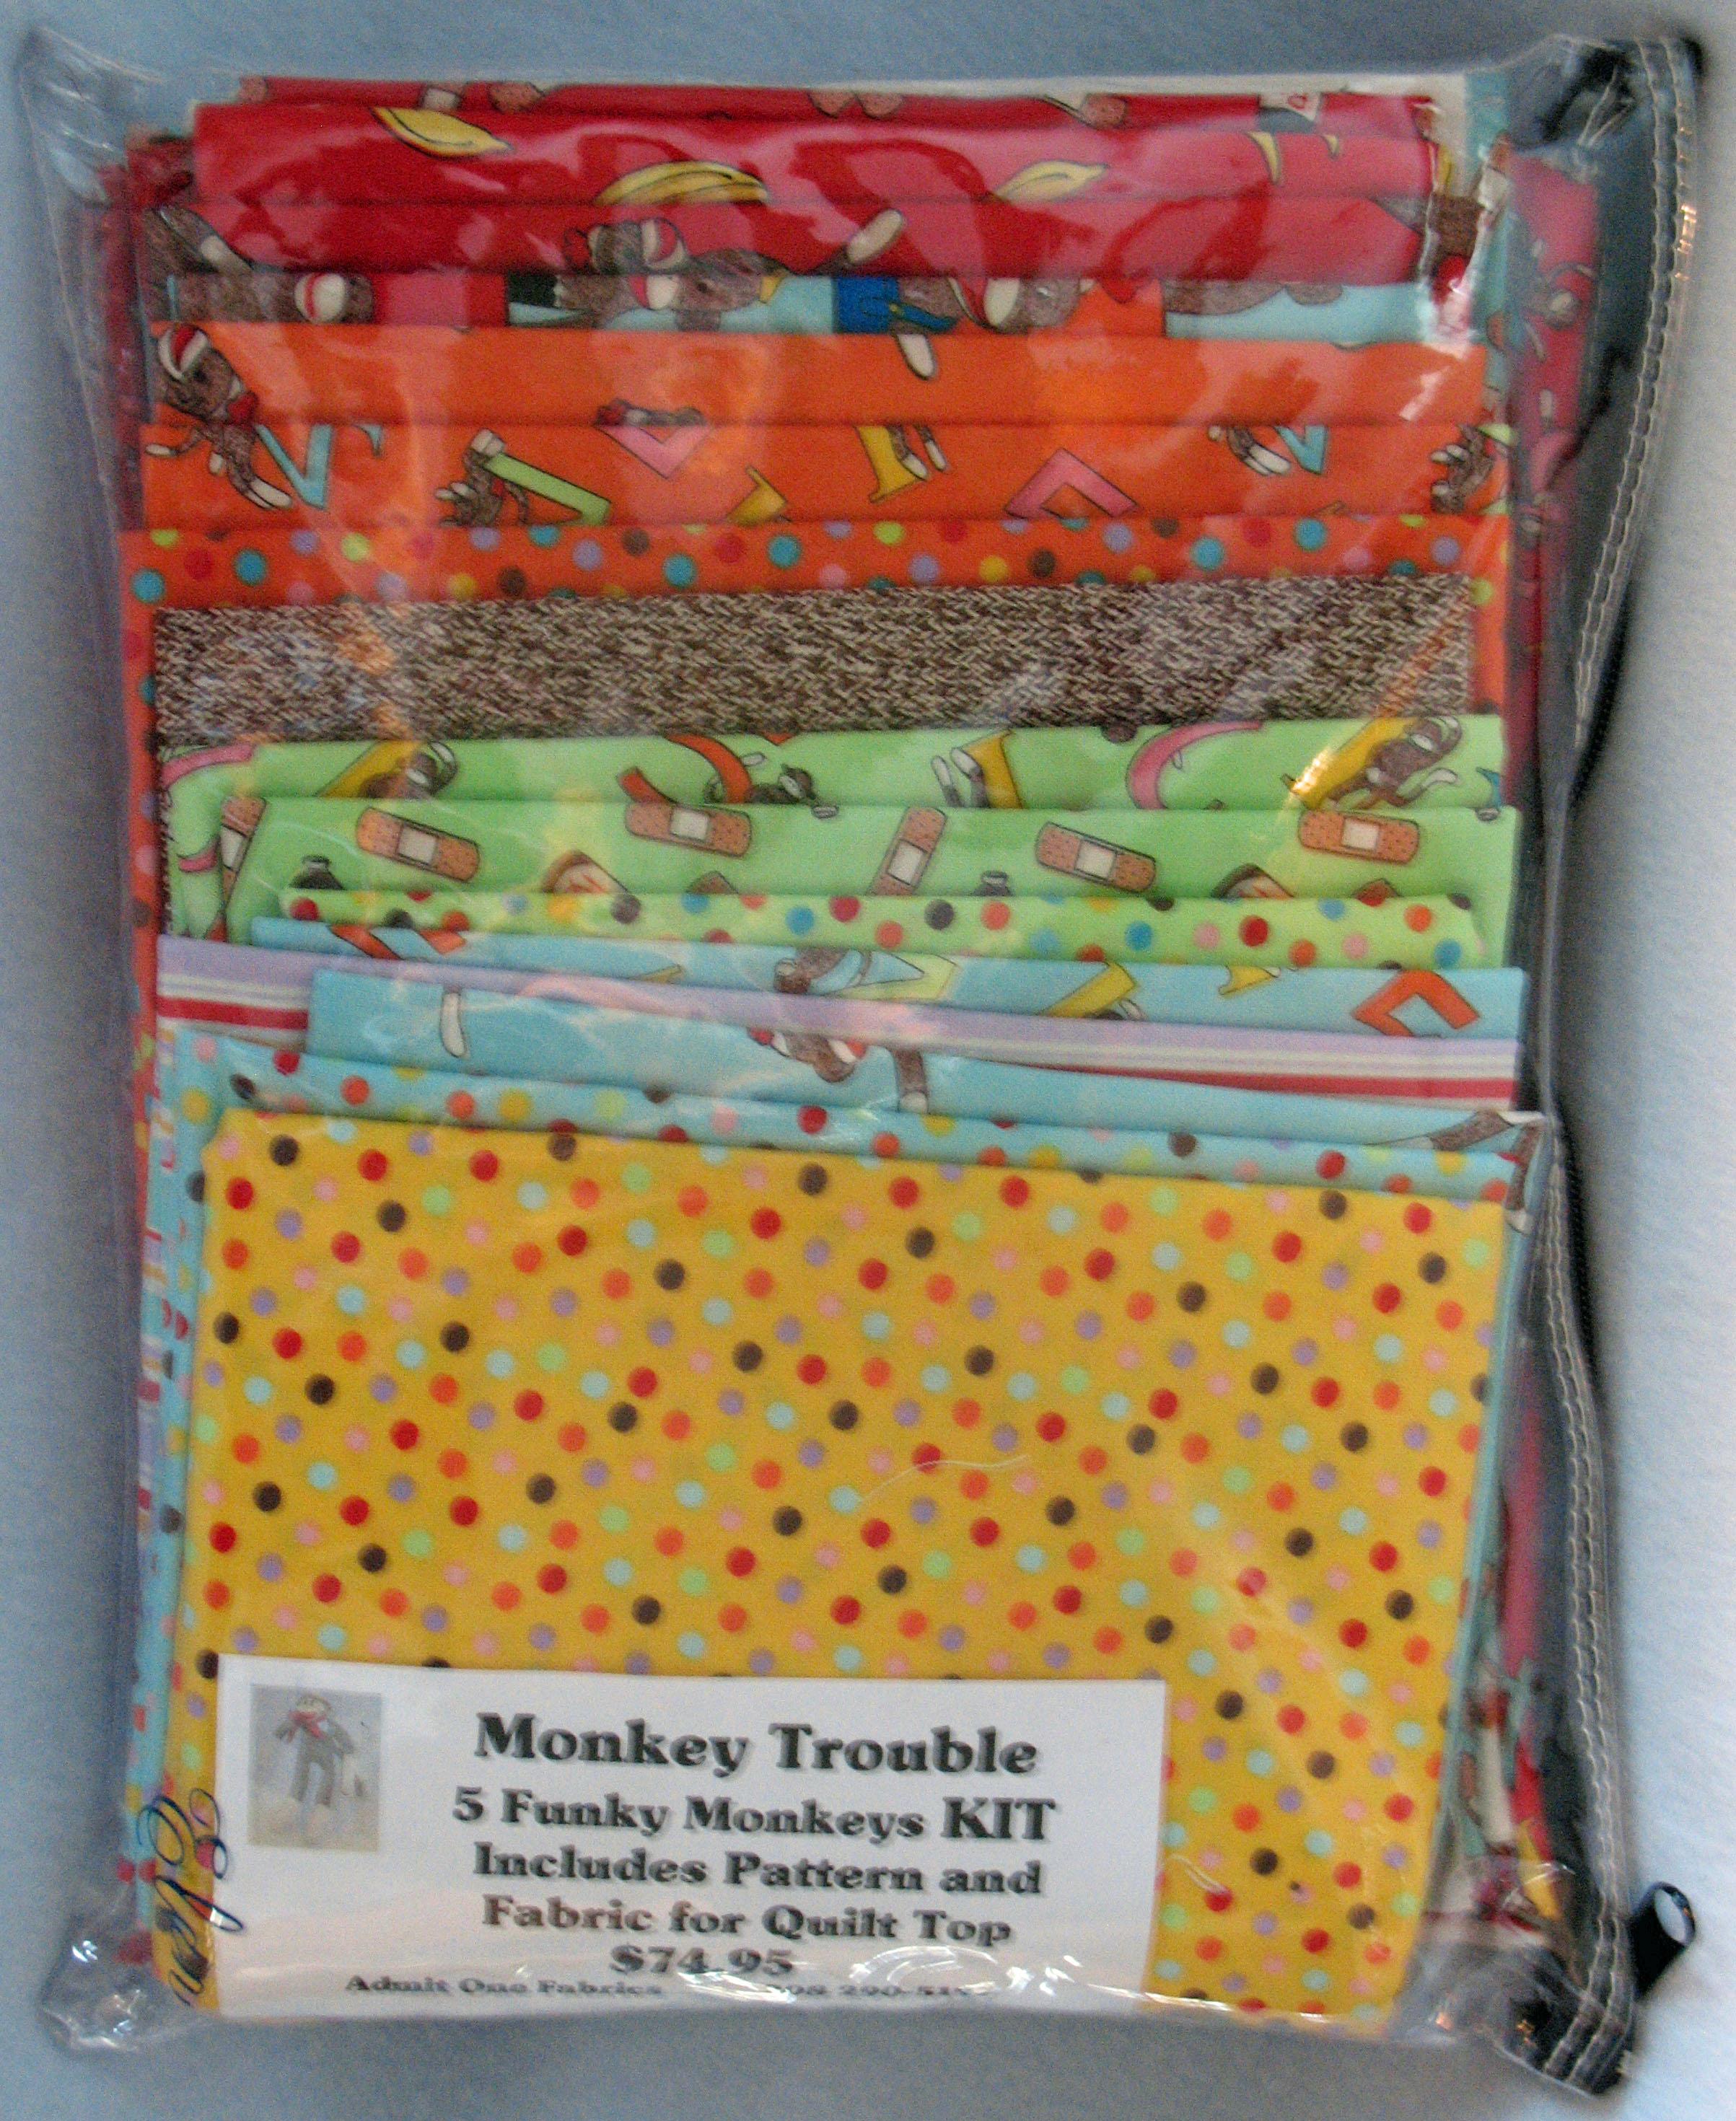 Funky Monkey Fabric and Kits - Admit One Fabrics : quilting fabric kits - Adamdwight.com